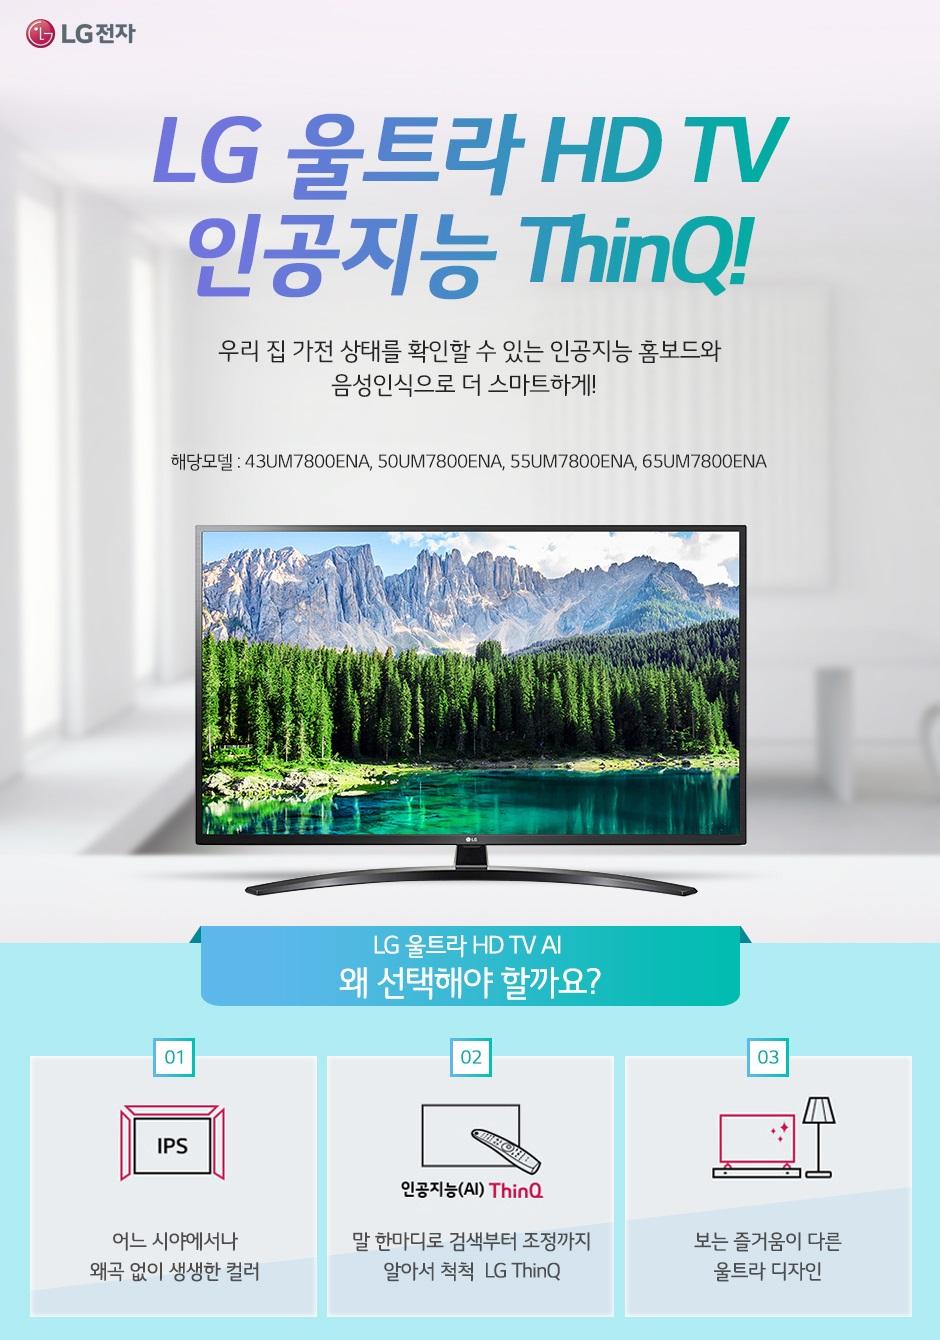 [LG전자] 세계 판매 1위 IPS로 완성한 화질. LG전자 Full-HD TV